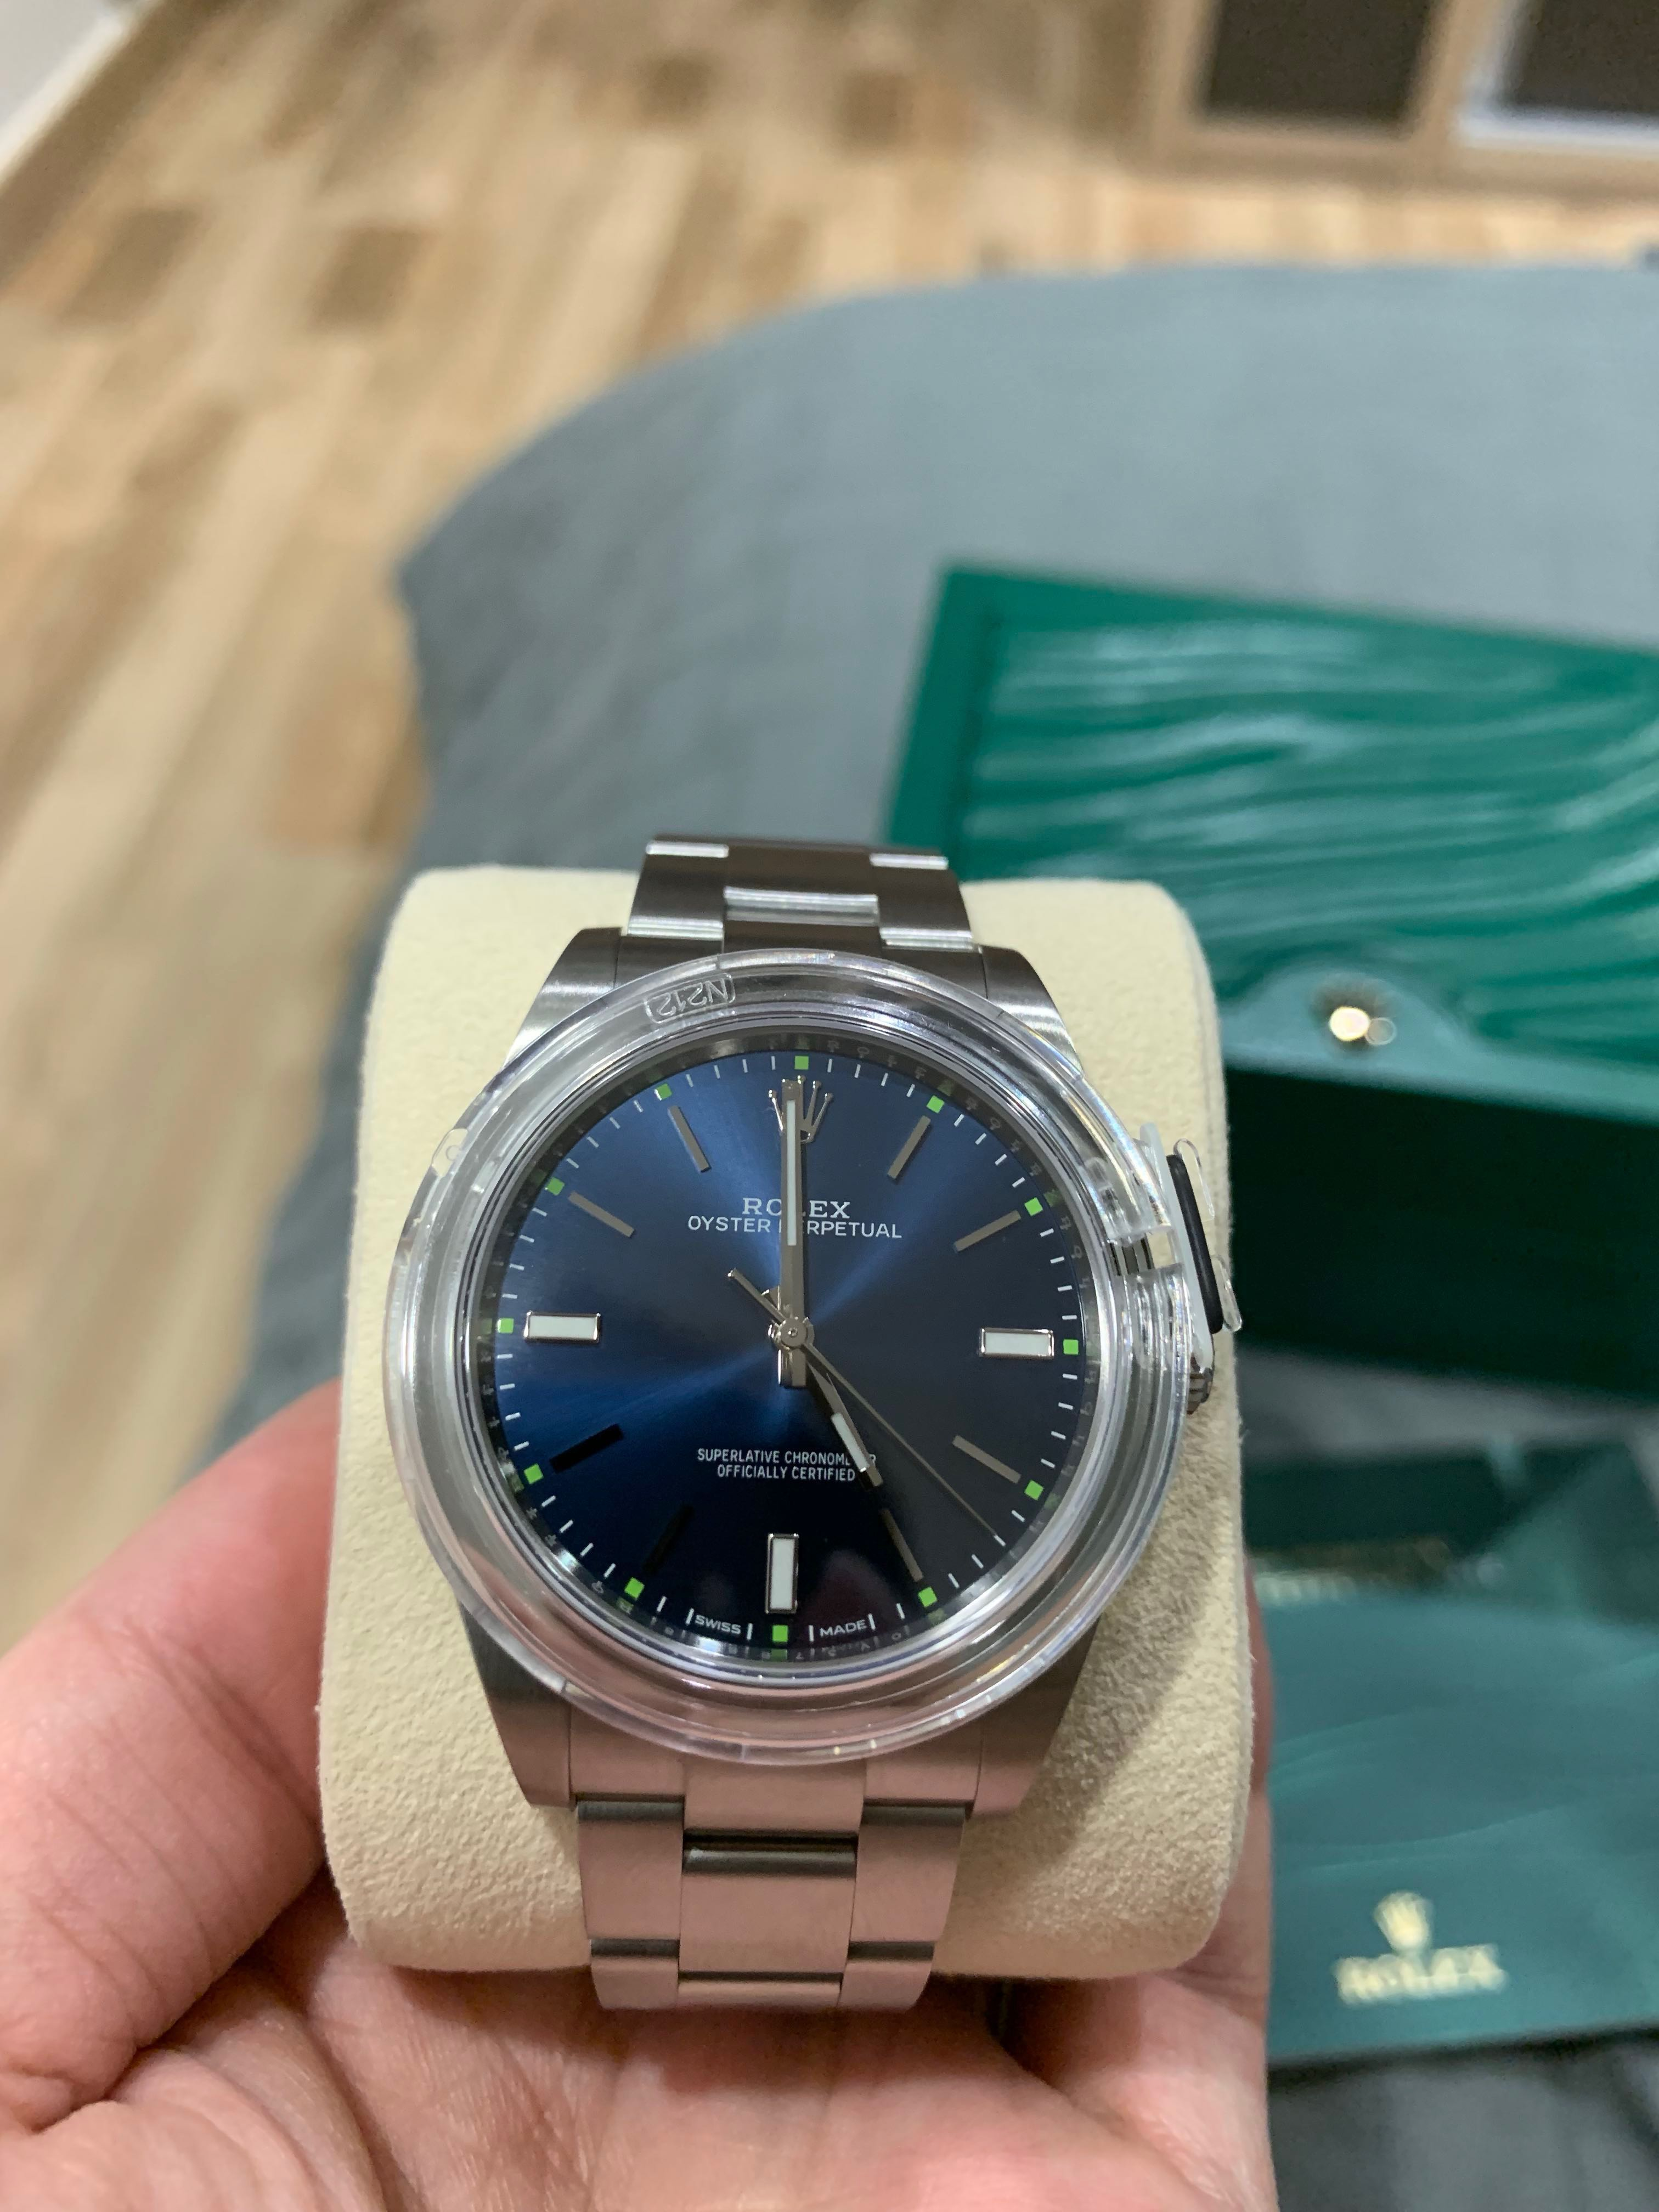 Rolex Oyster Perpetual 39 (Sunburst Blue)